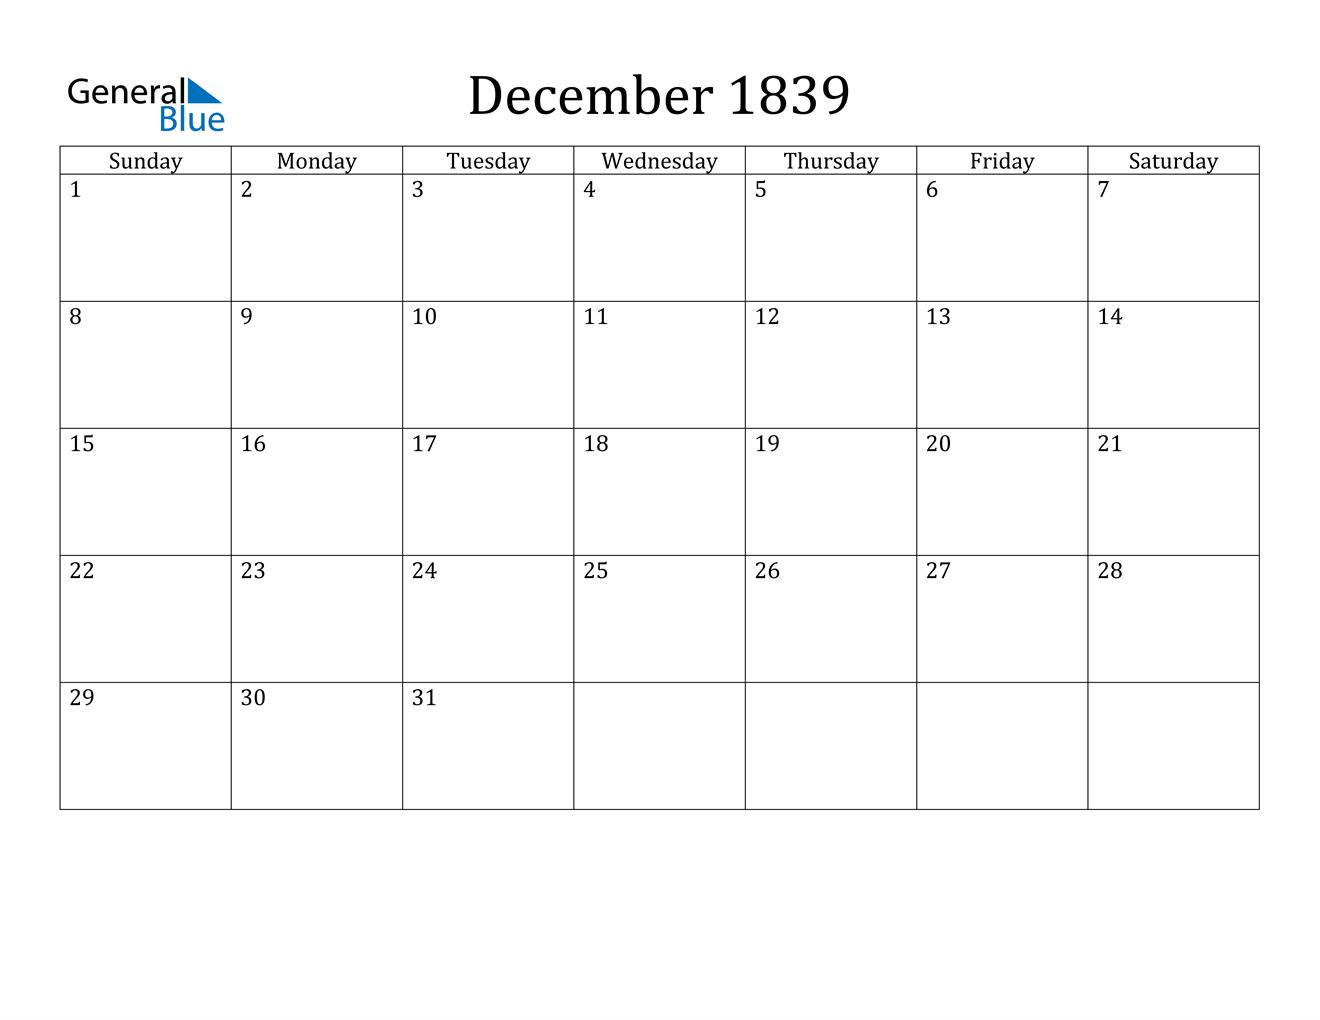 Image of December 1839 Calendar